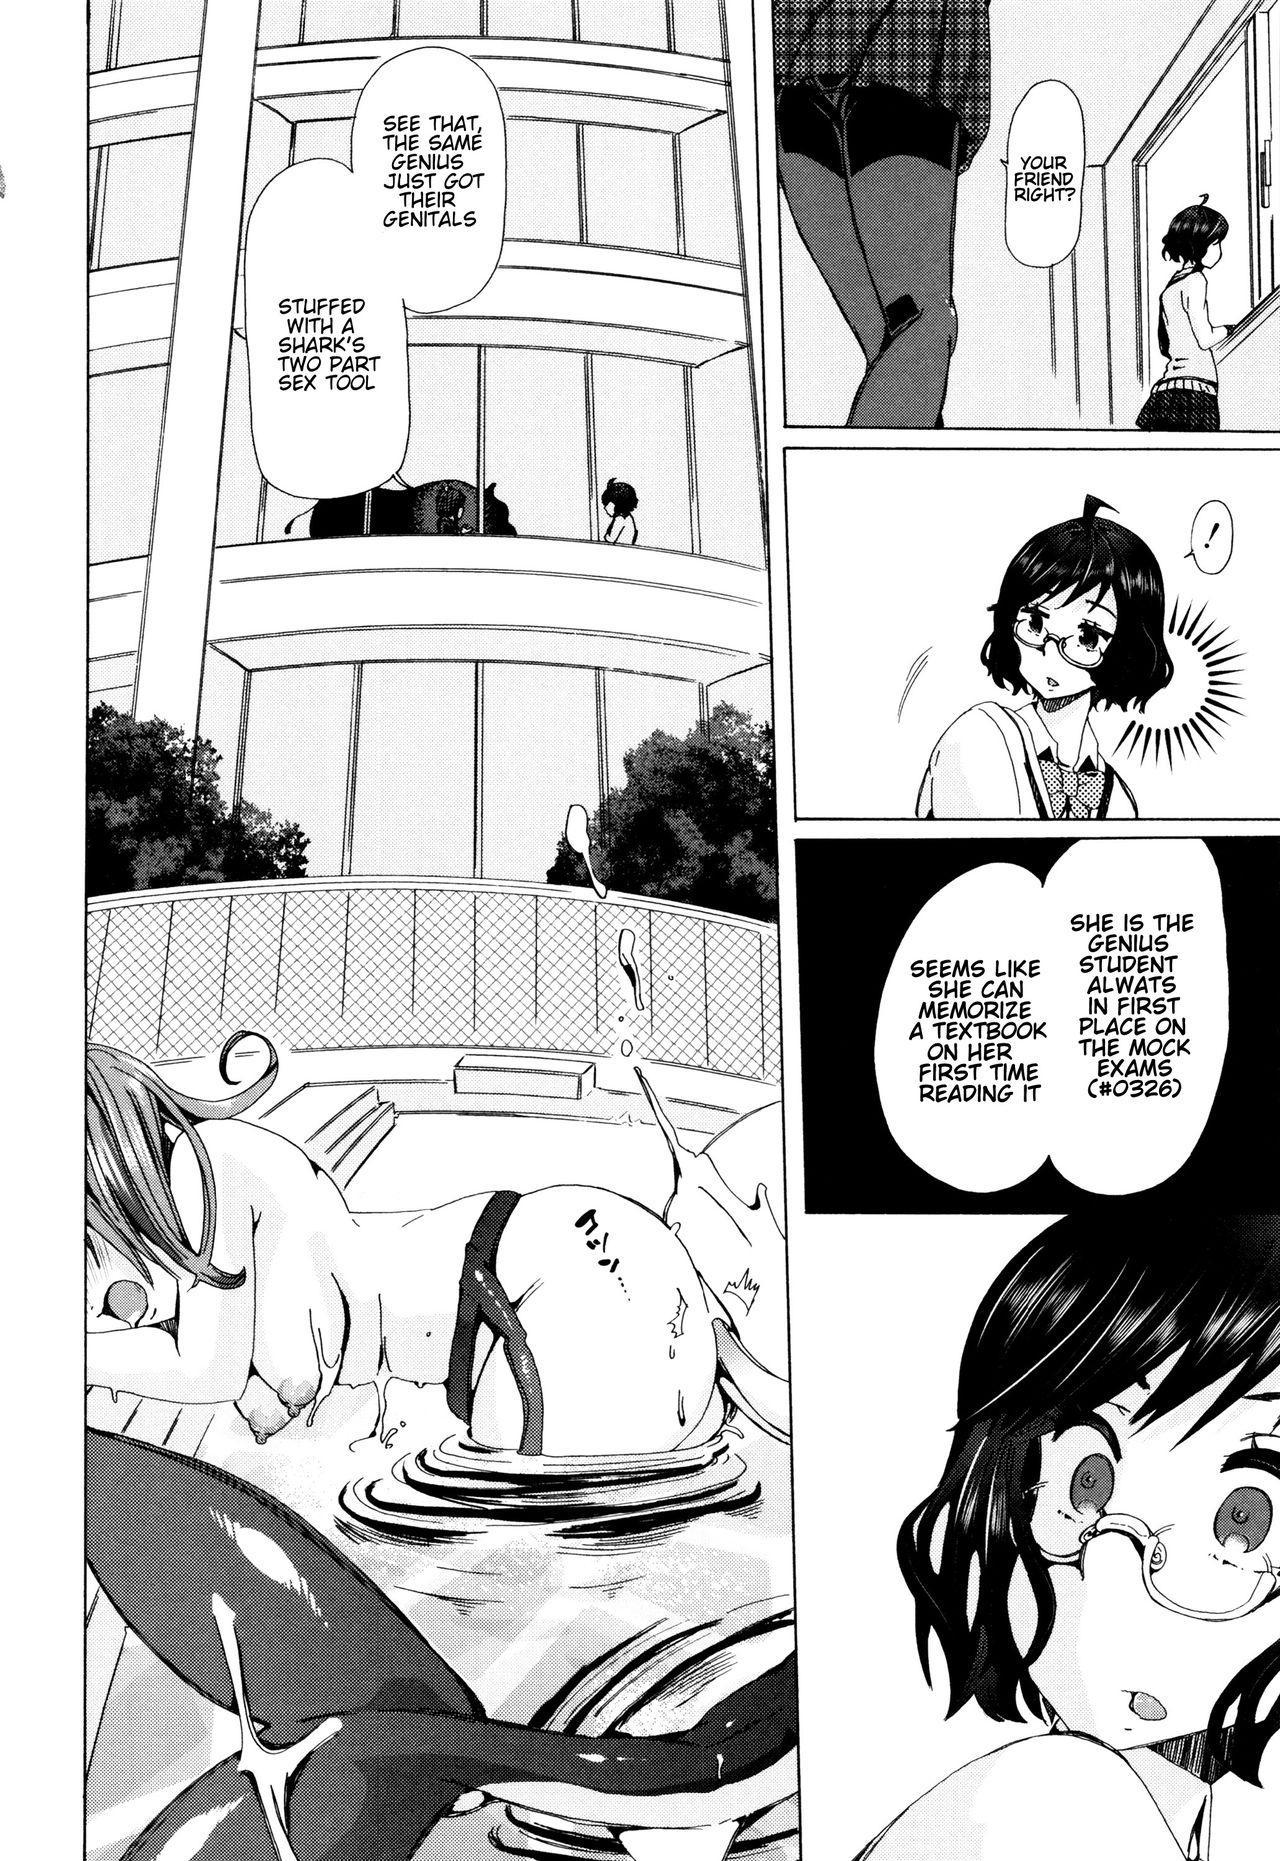 [Chikiko] Juukan Kyoushitsu - Bestiality Classroom Ch. 1-5 [English] [Neeko7] 107